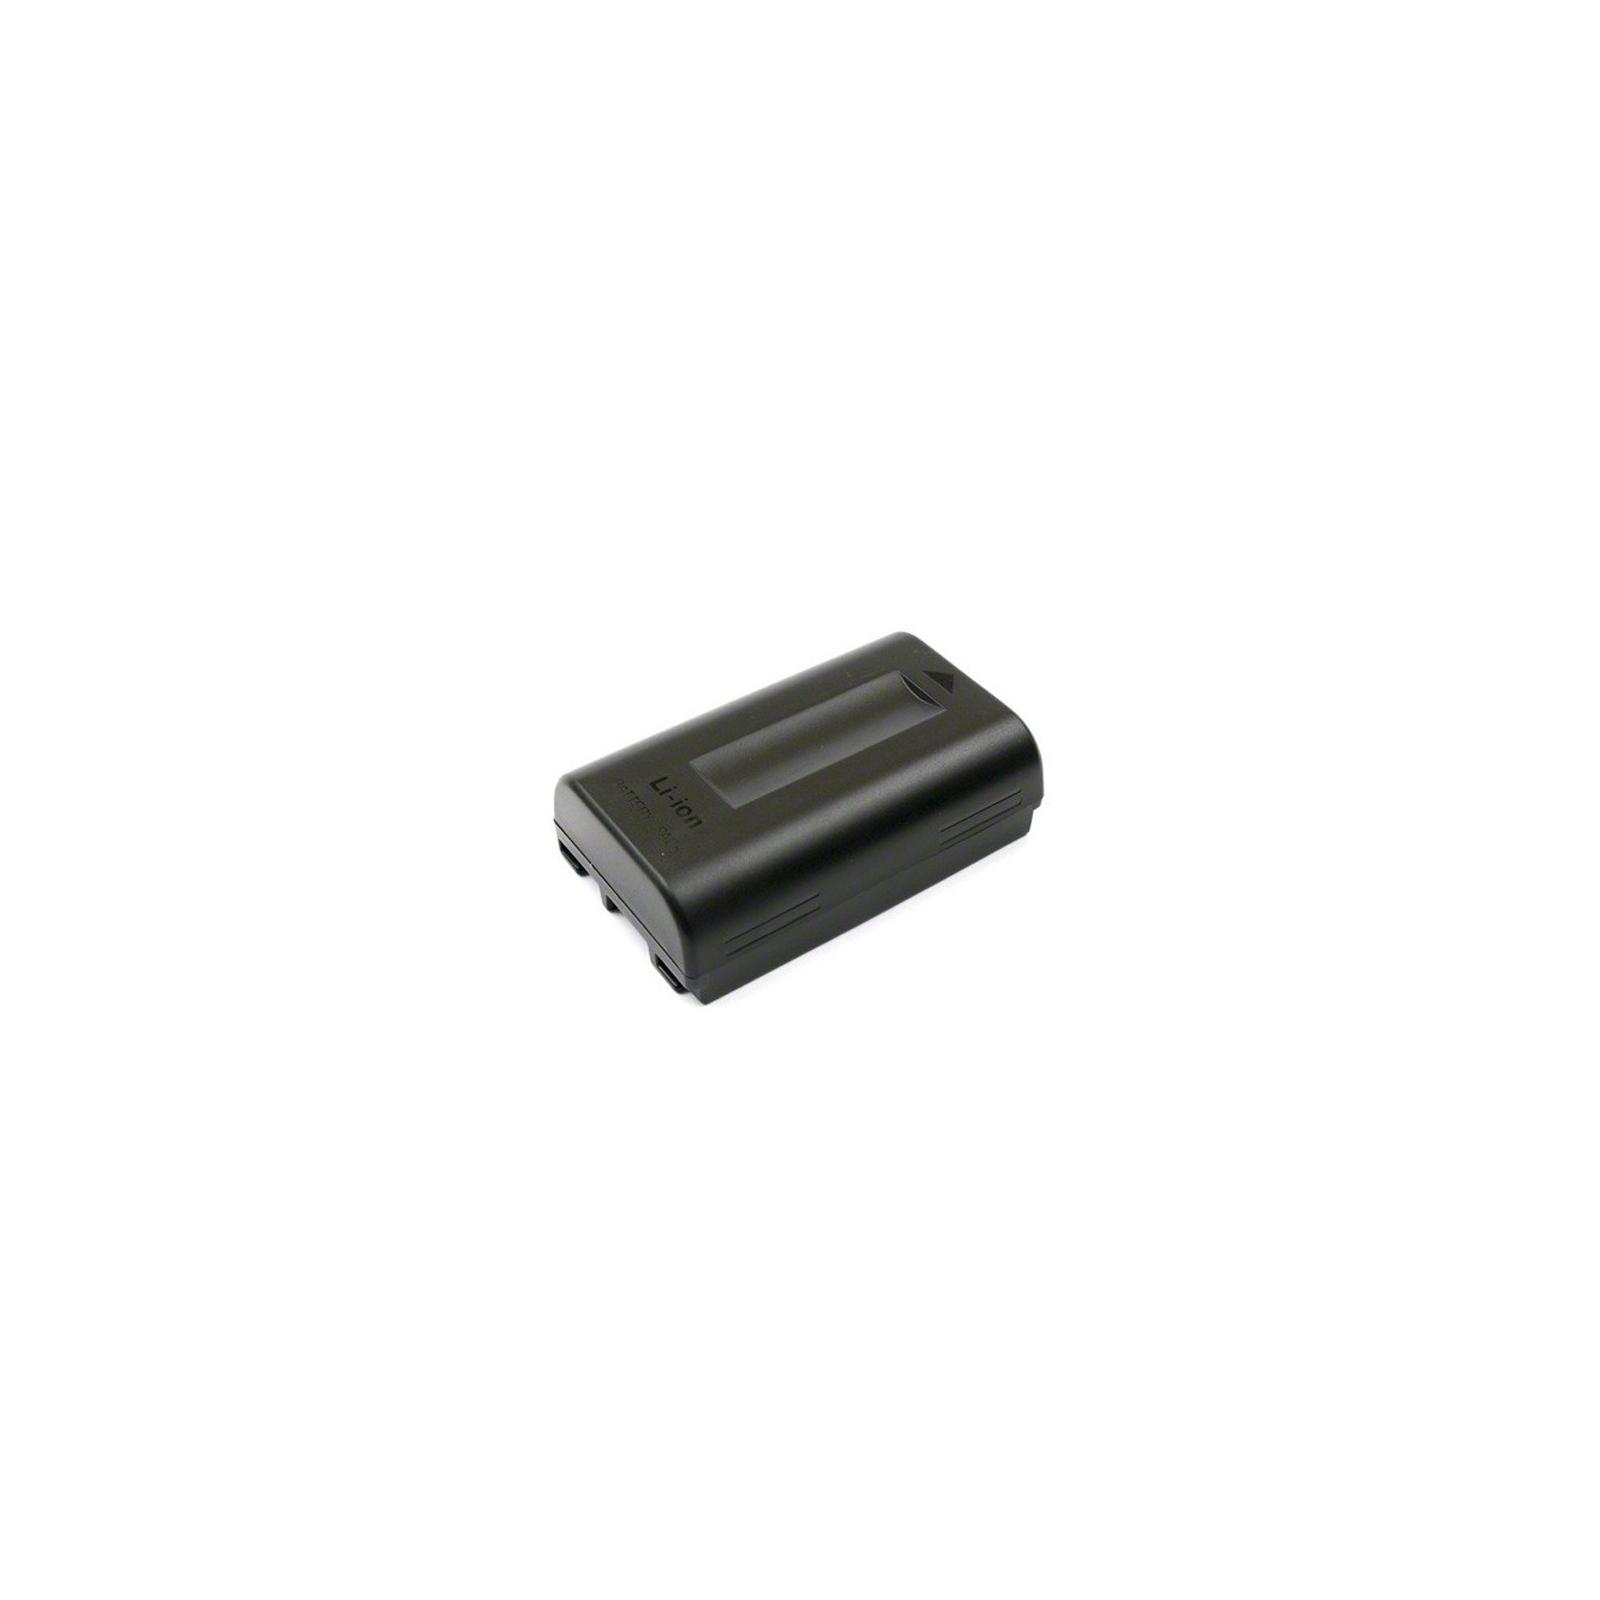 Аккумулятор к фото/видео EXTRADIGITAL Panasonic CGR-V620, CGR-V26S (DV00DV1323)